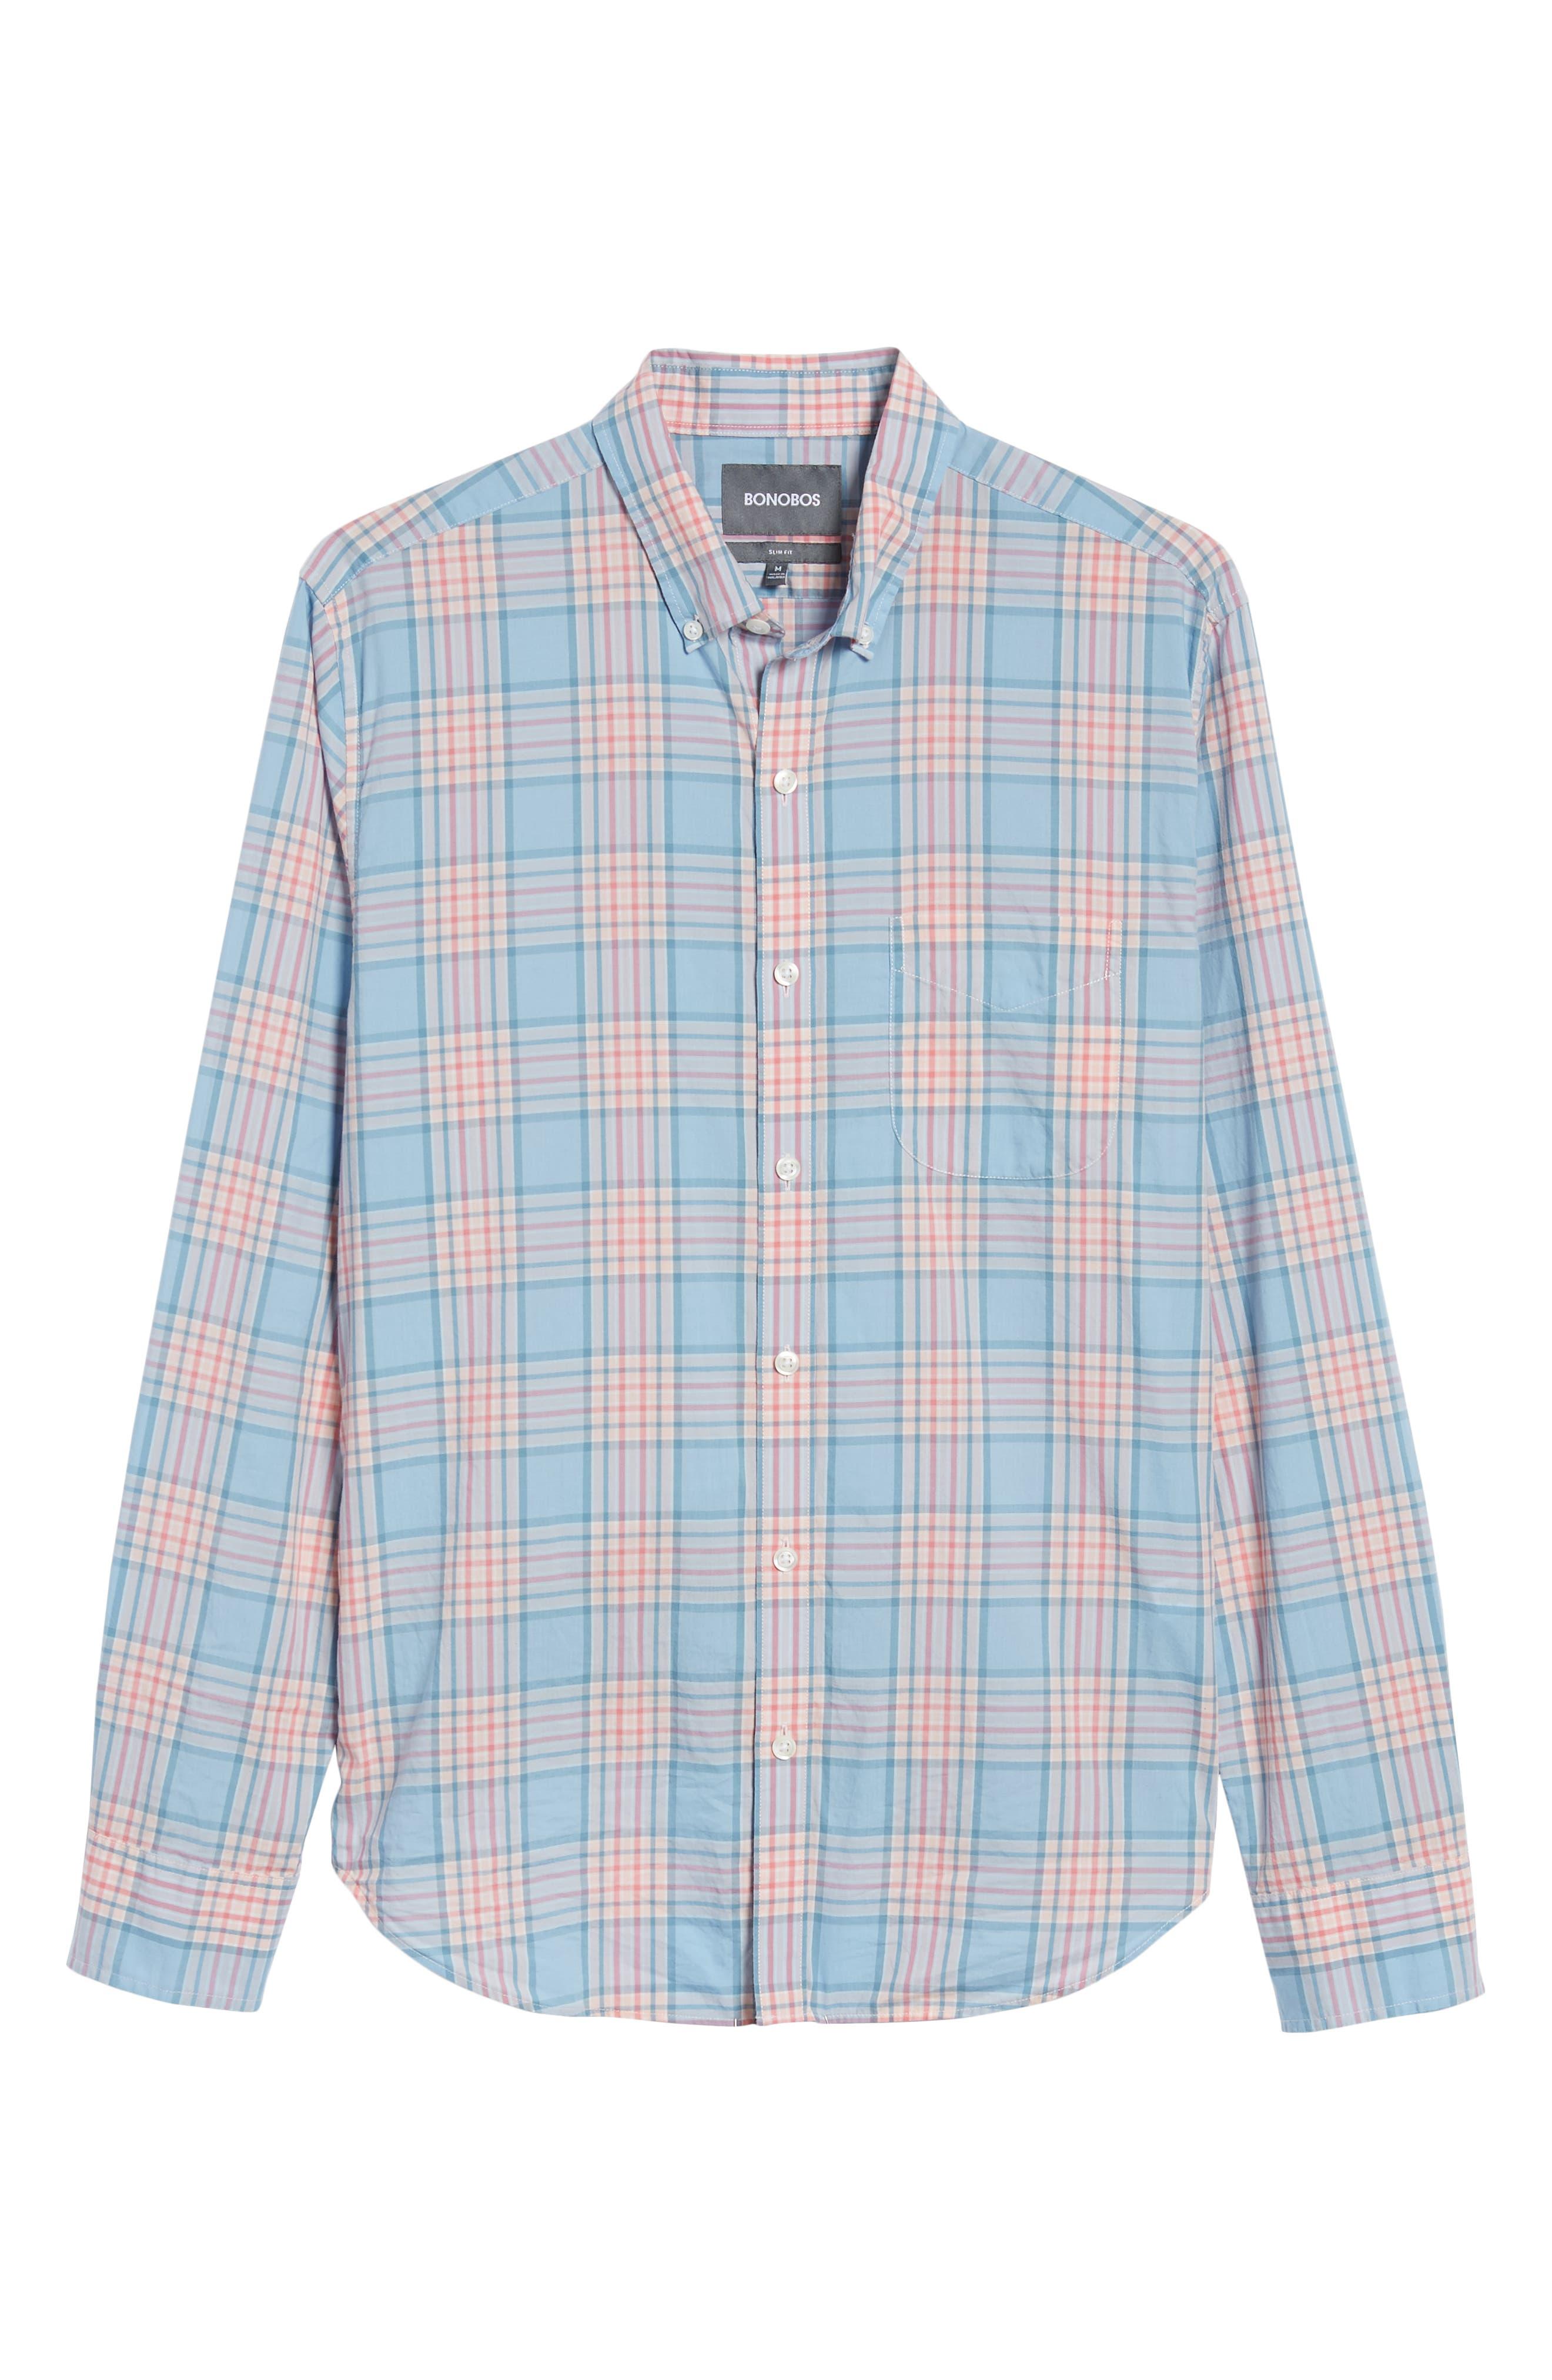 Slim Fit Plaid Sport Shirt,                             Alternate thumbnail 6, color,                             Sandoval Plaid - Peach Melba